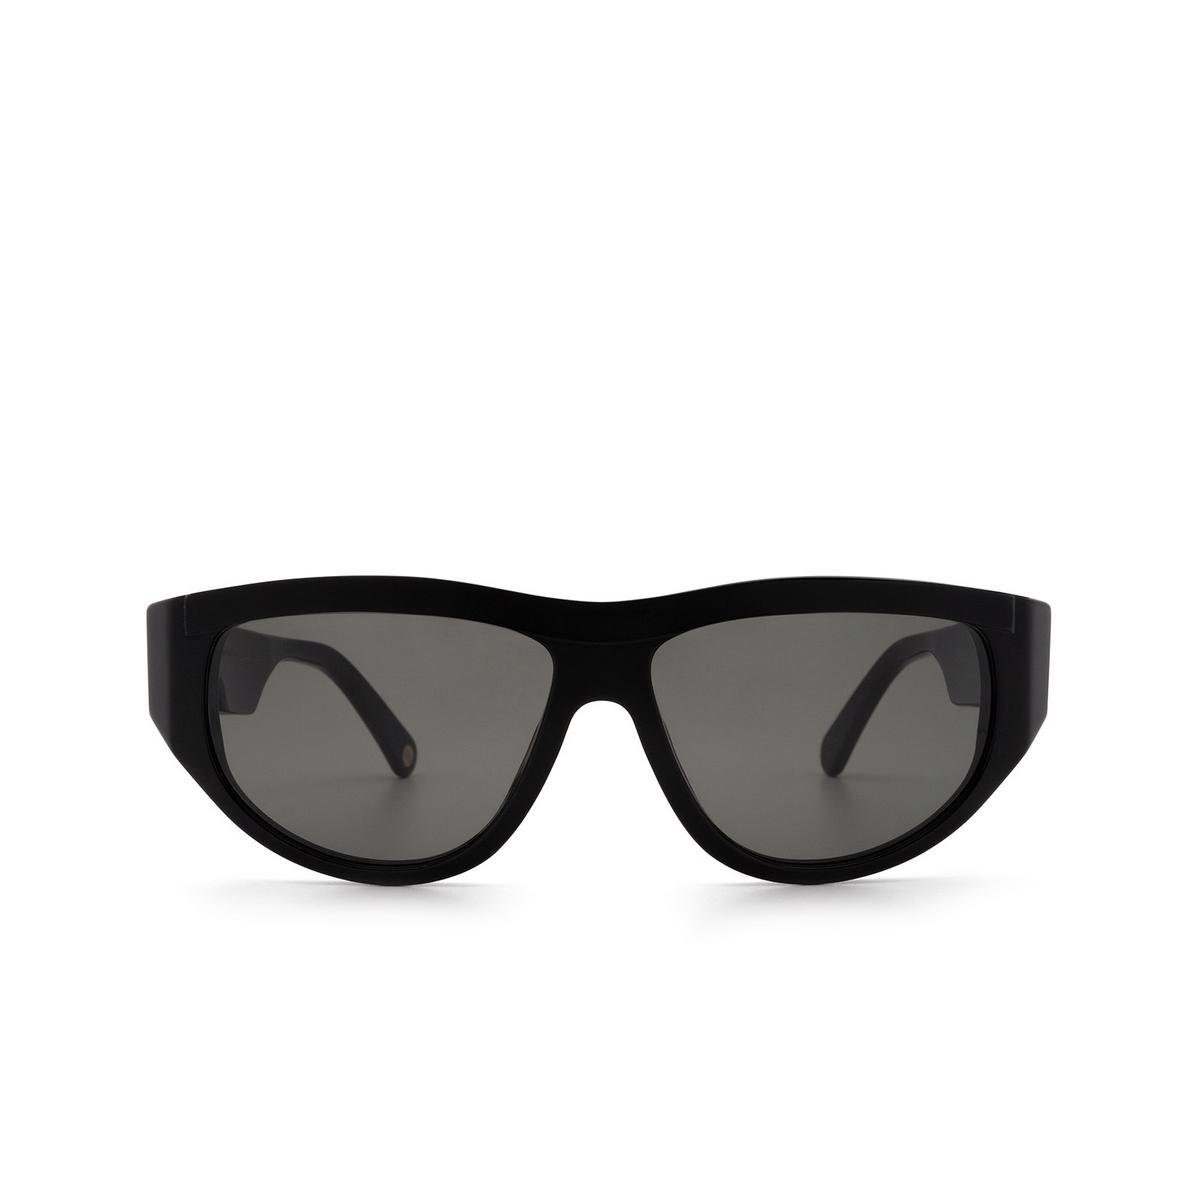 Ahlem® Mask Sunglasses: Bel Air color Black.